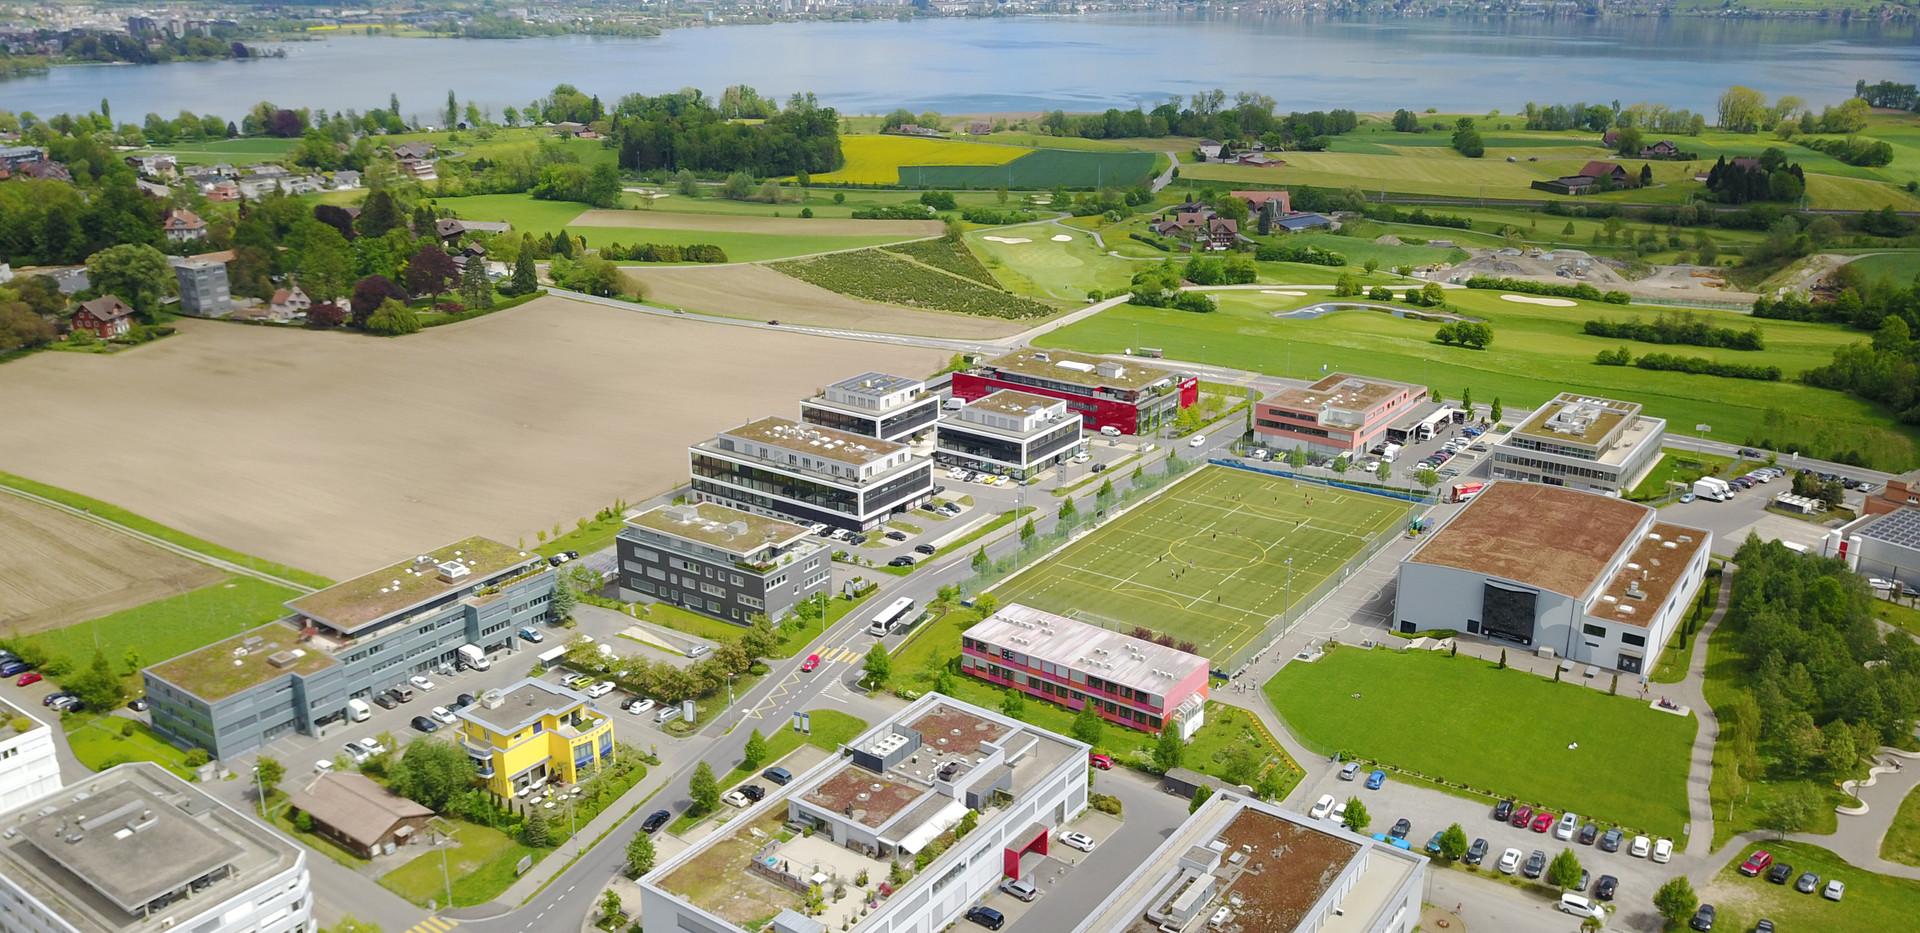 Blick Richtung Zug und Golfplatz  /  View towards train and golf course